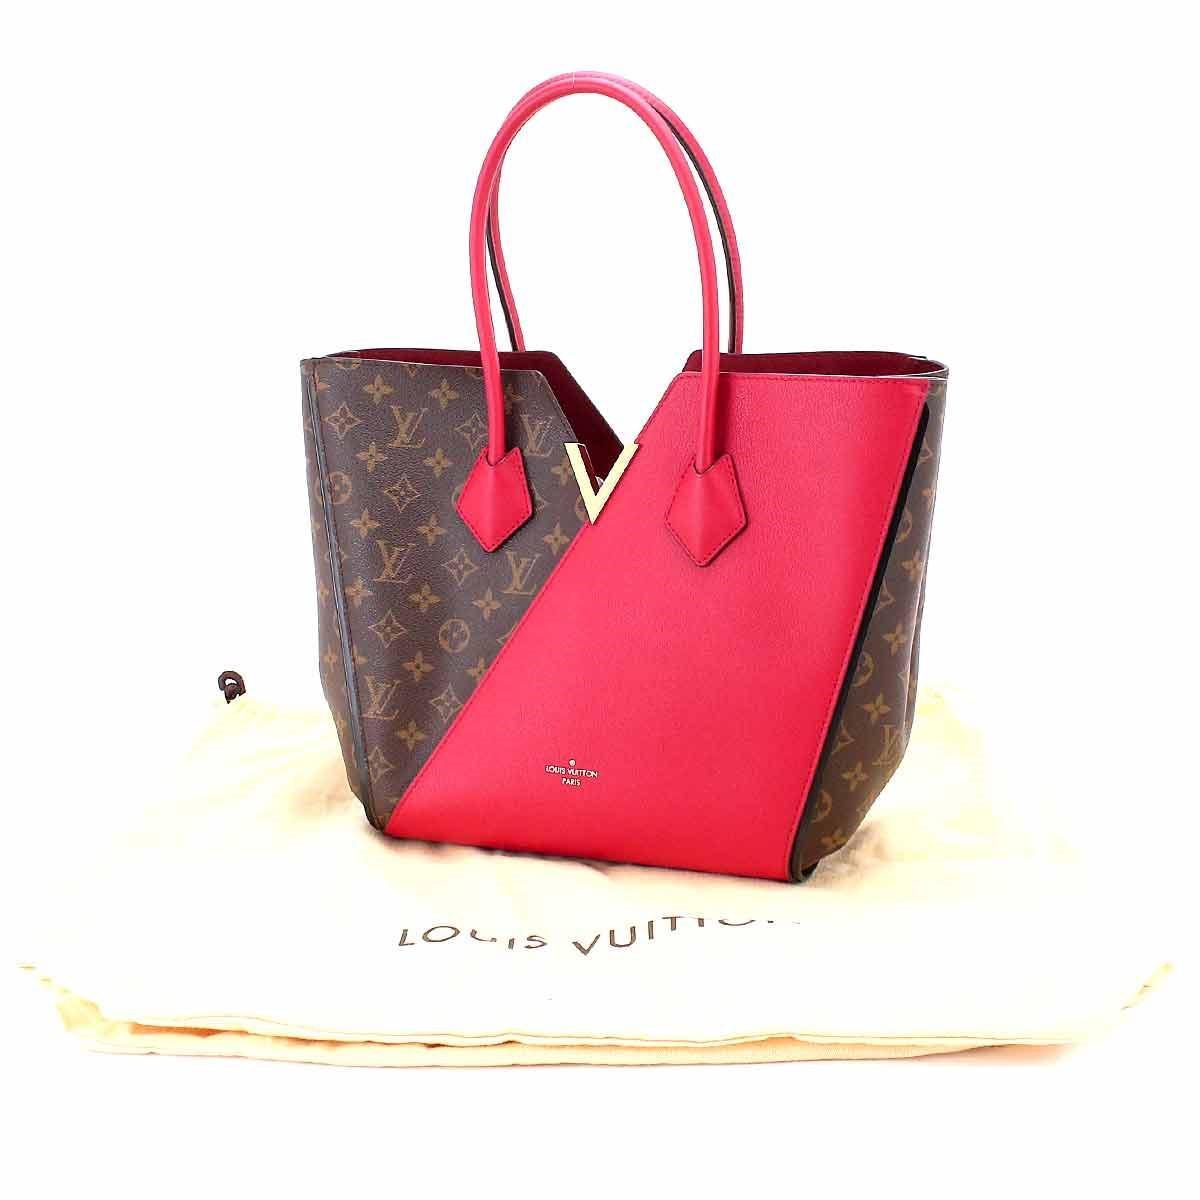 Lyst - Louis Vuitton Monogram Kimono Tote Bag Leather Cerise M40459 ... 03105a3bb1e